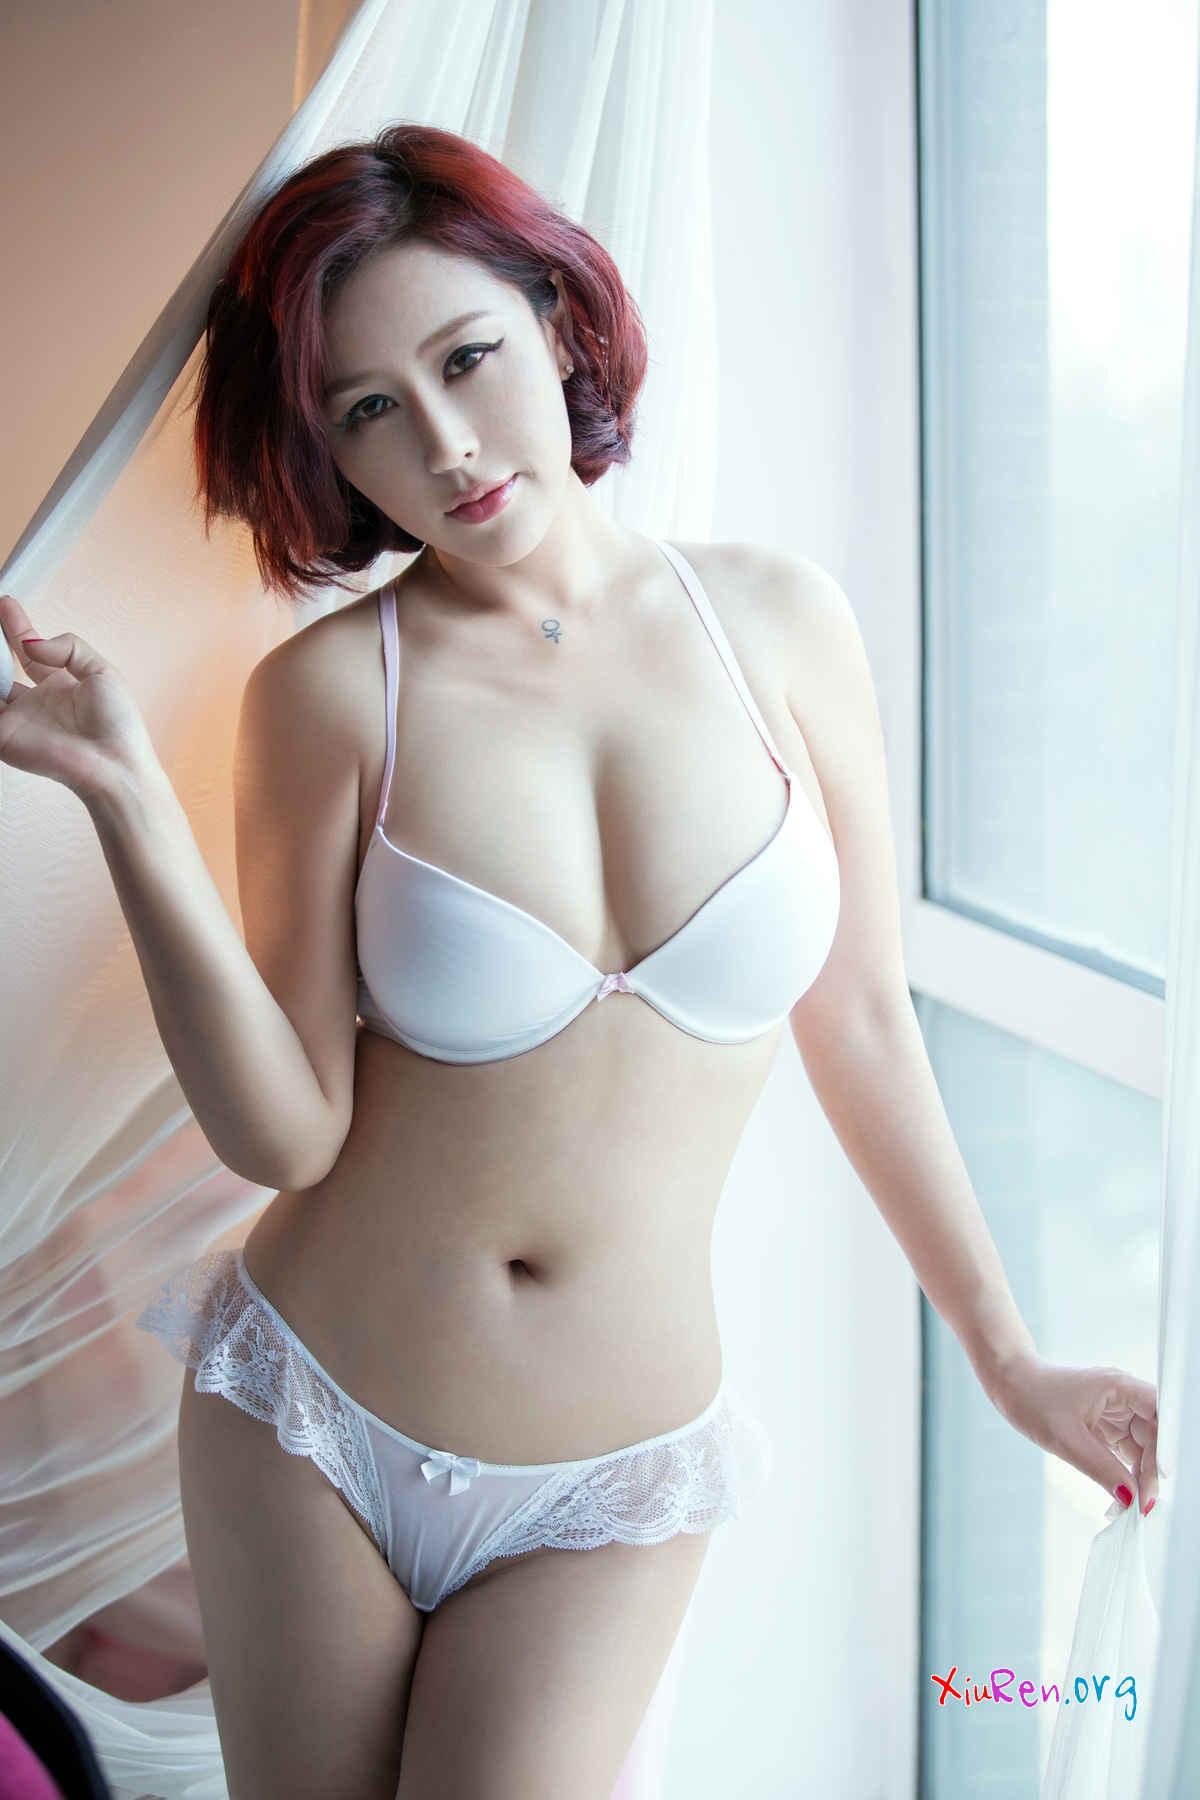 coreano putas 2017